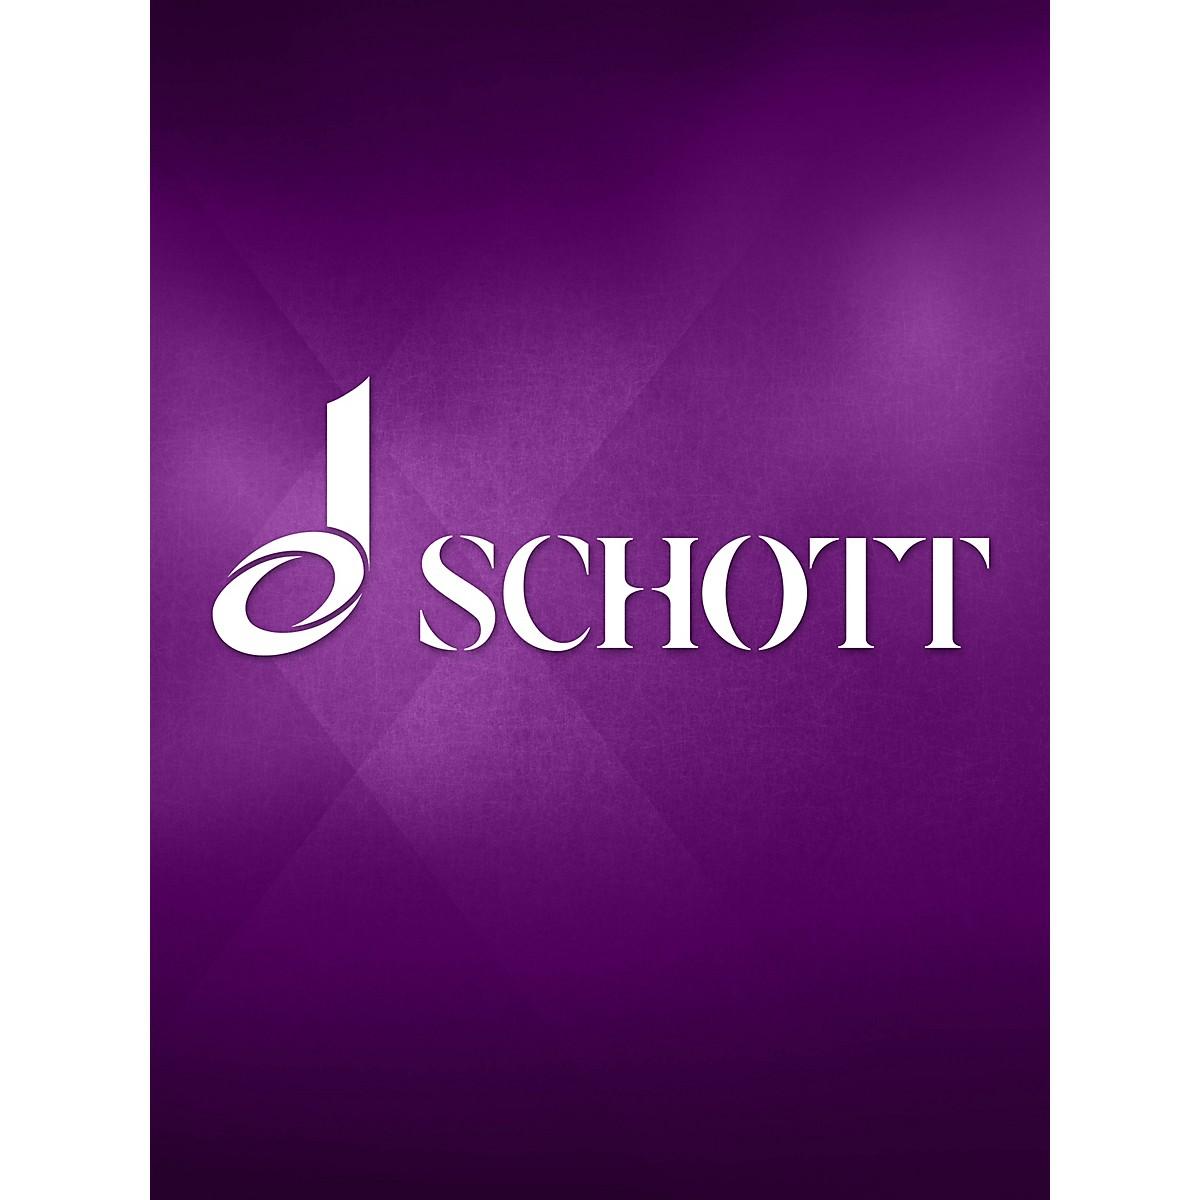 Glocken Verlag Fieber (Fever) (German/English) for Tenor and Orchestra (Piano Reduction) Schott Series by Franz Lehár